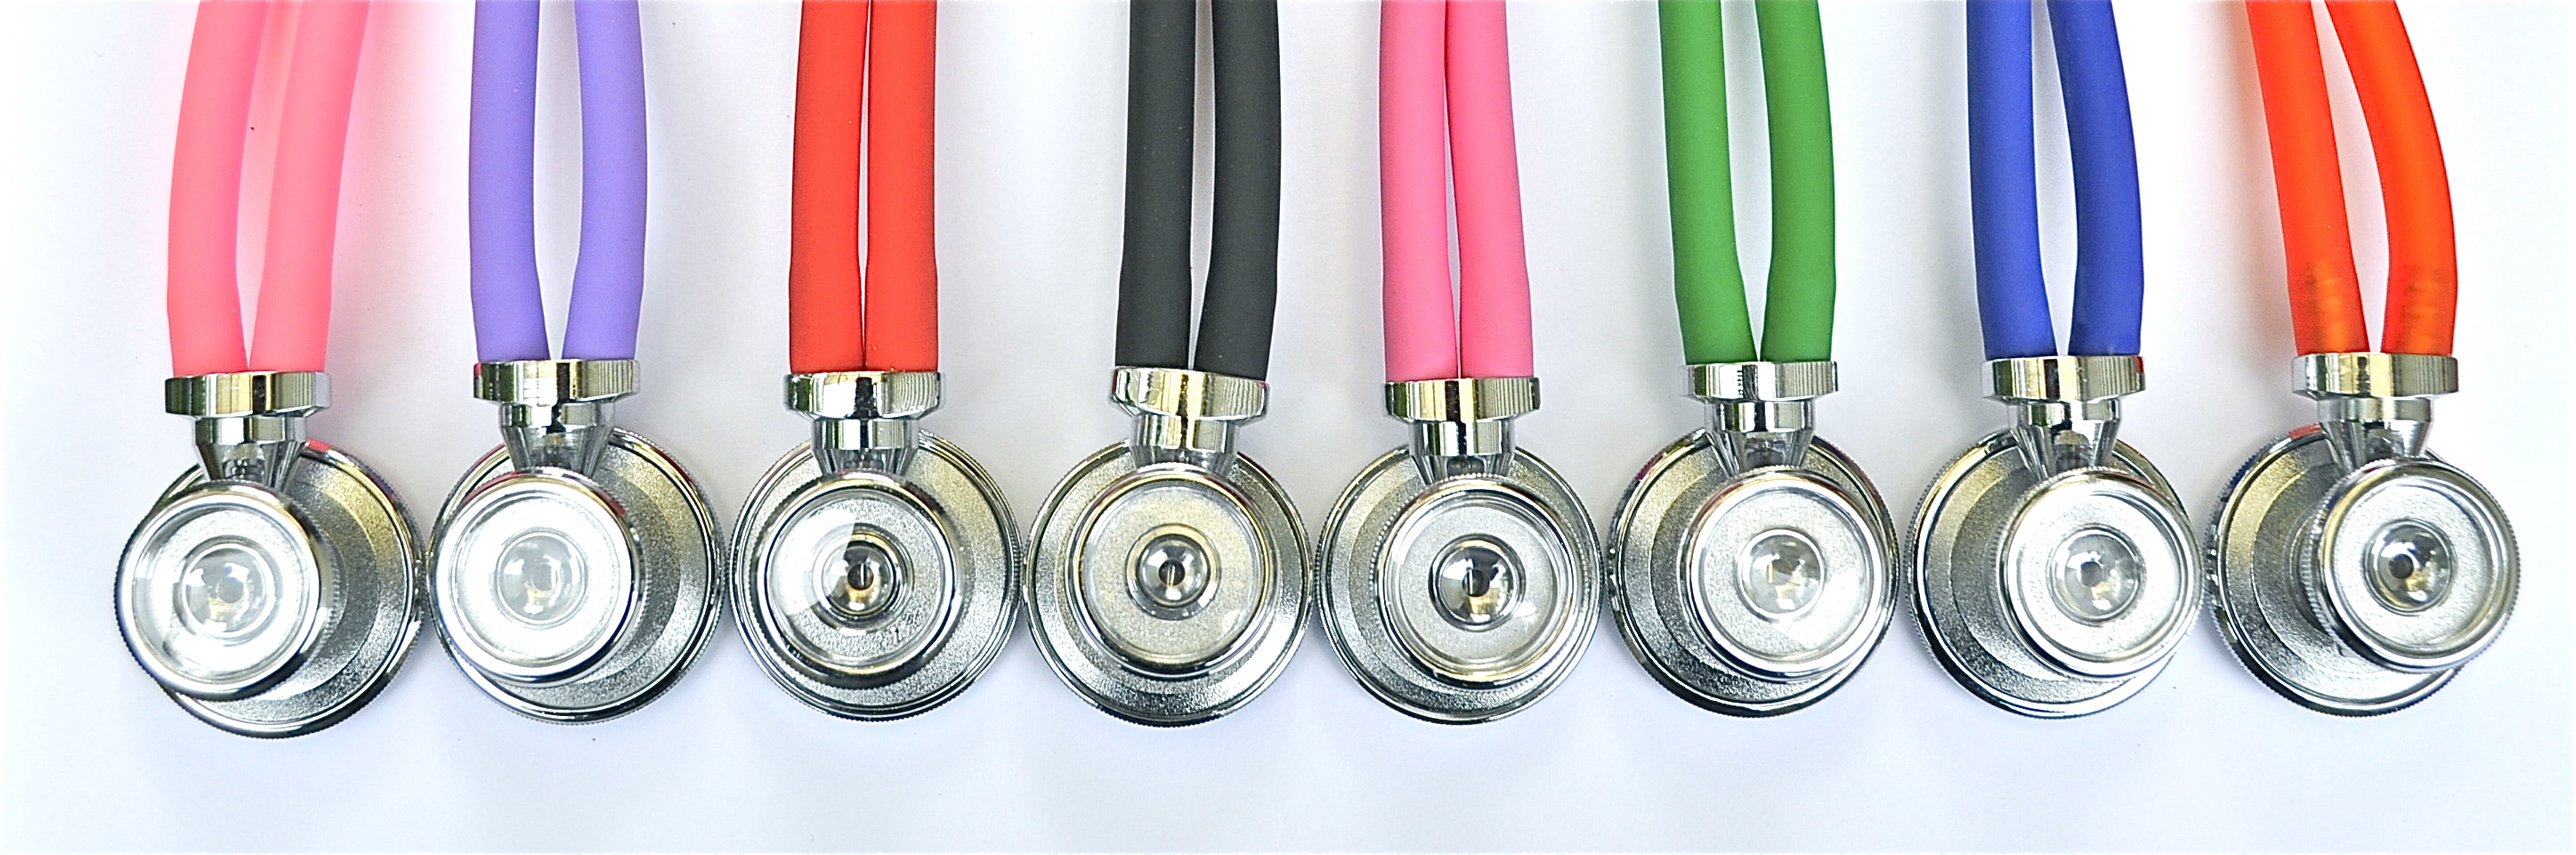 Rappaport Sprague Stethoscope